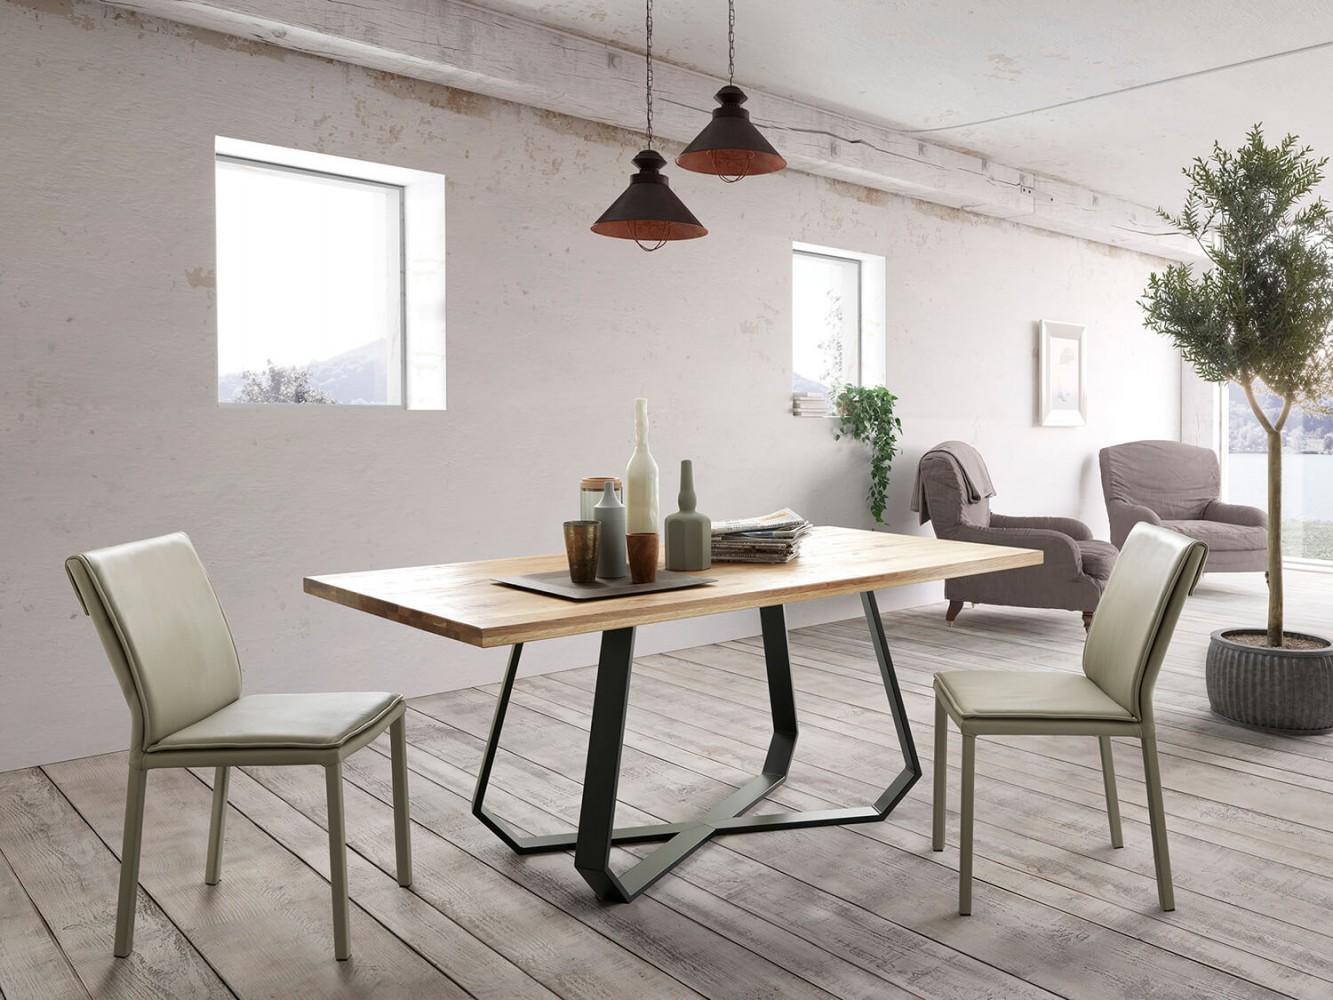 altacom esstisch udine eiche massiv 180x90 cm. Black Bedroom Furniture Sets. Home Design Ideas